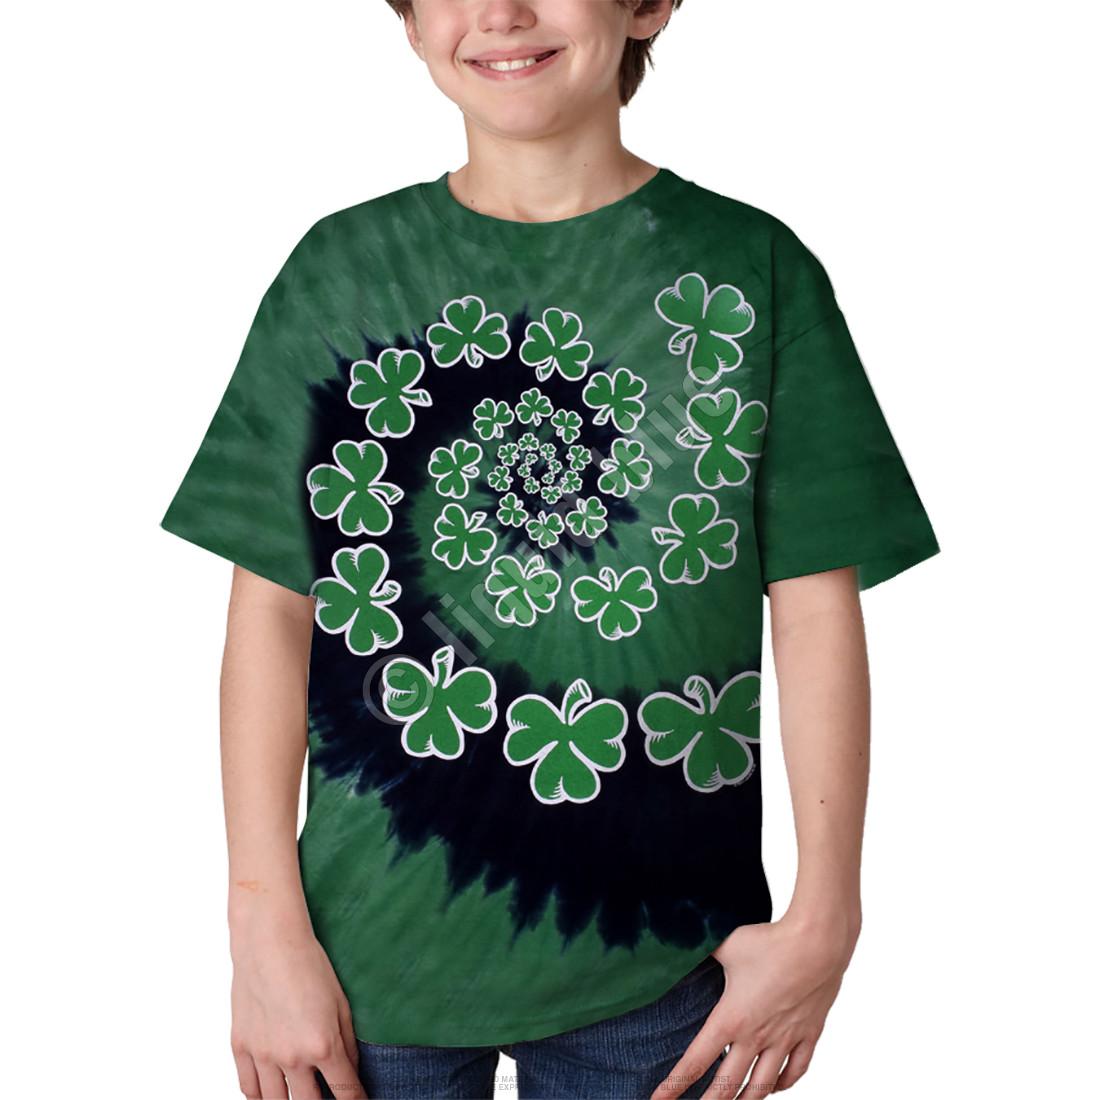 Shamrock Spiral Youth Tie-Dye T-Shirt